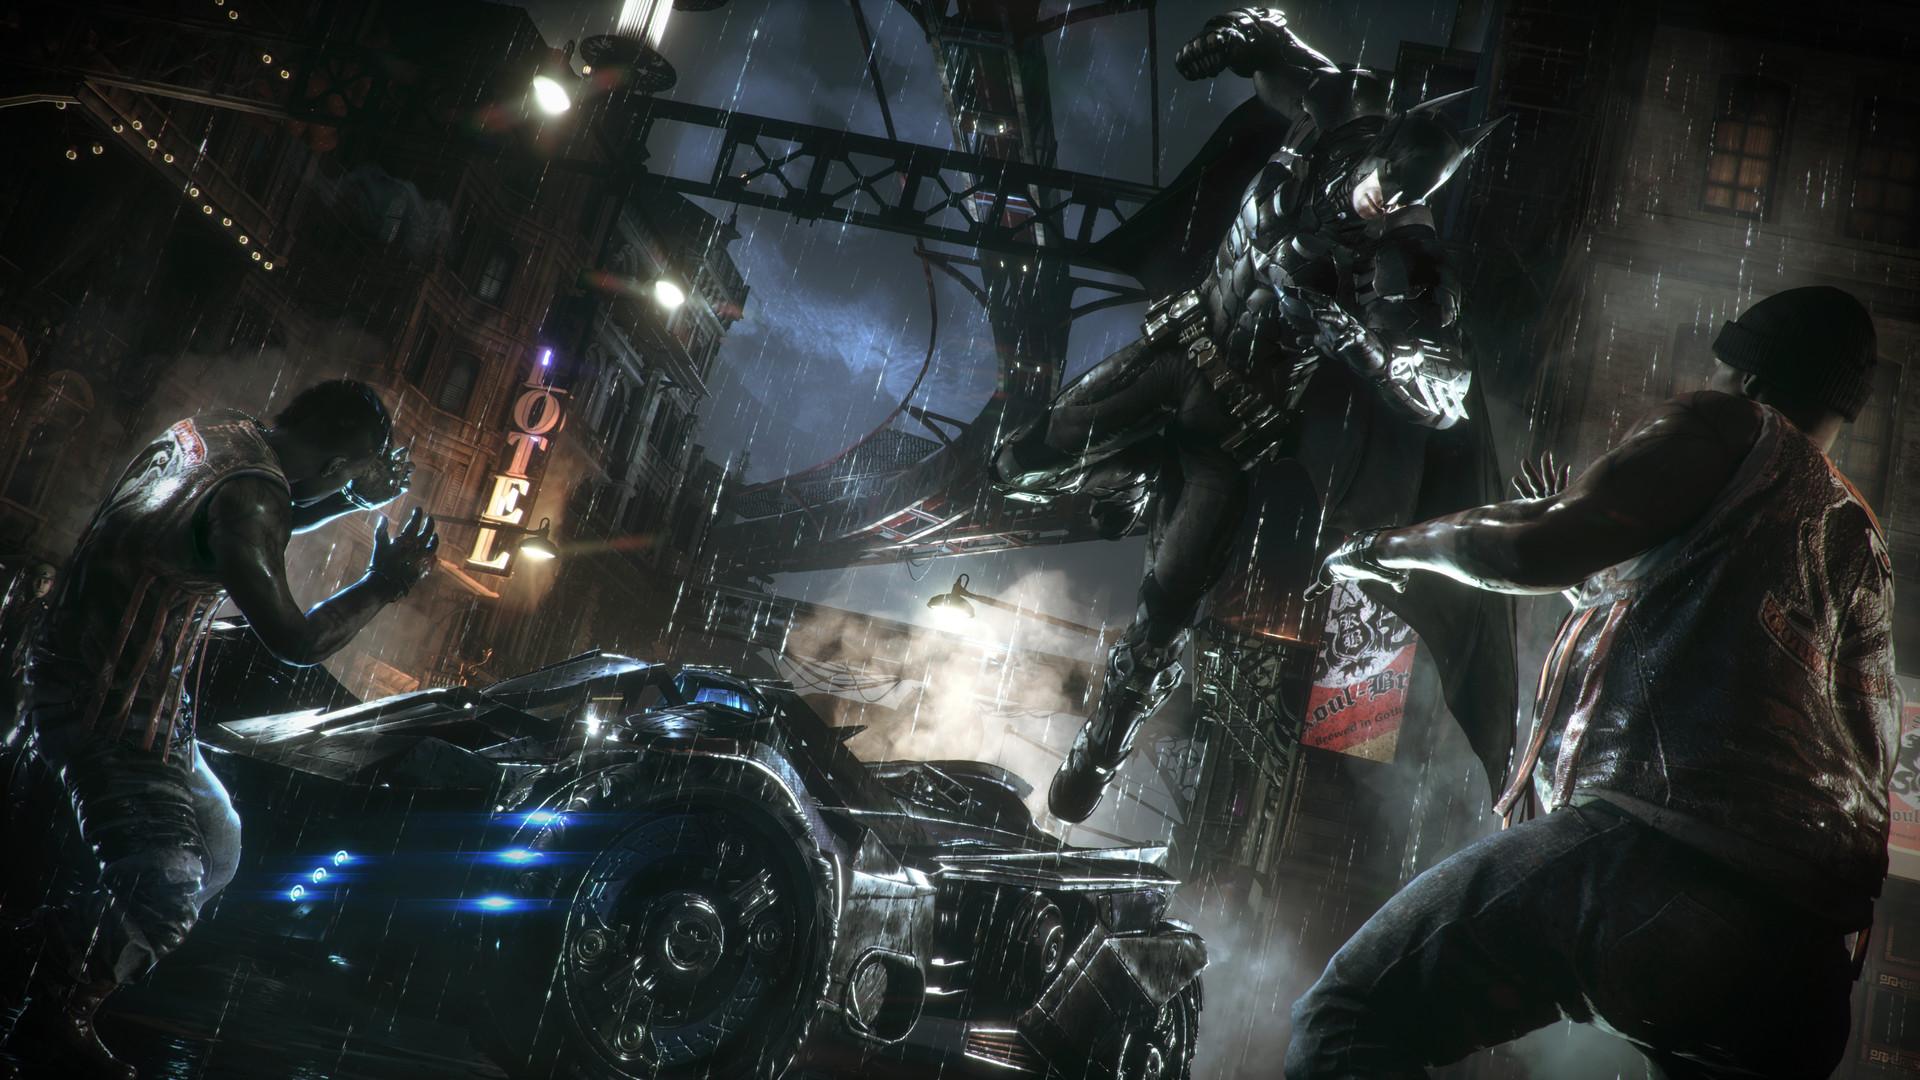 Batman Arkham Legacy Is The Next Batman Game According To